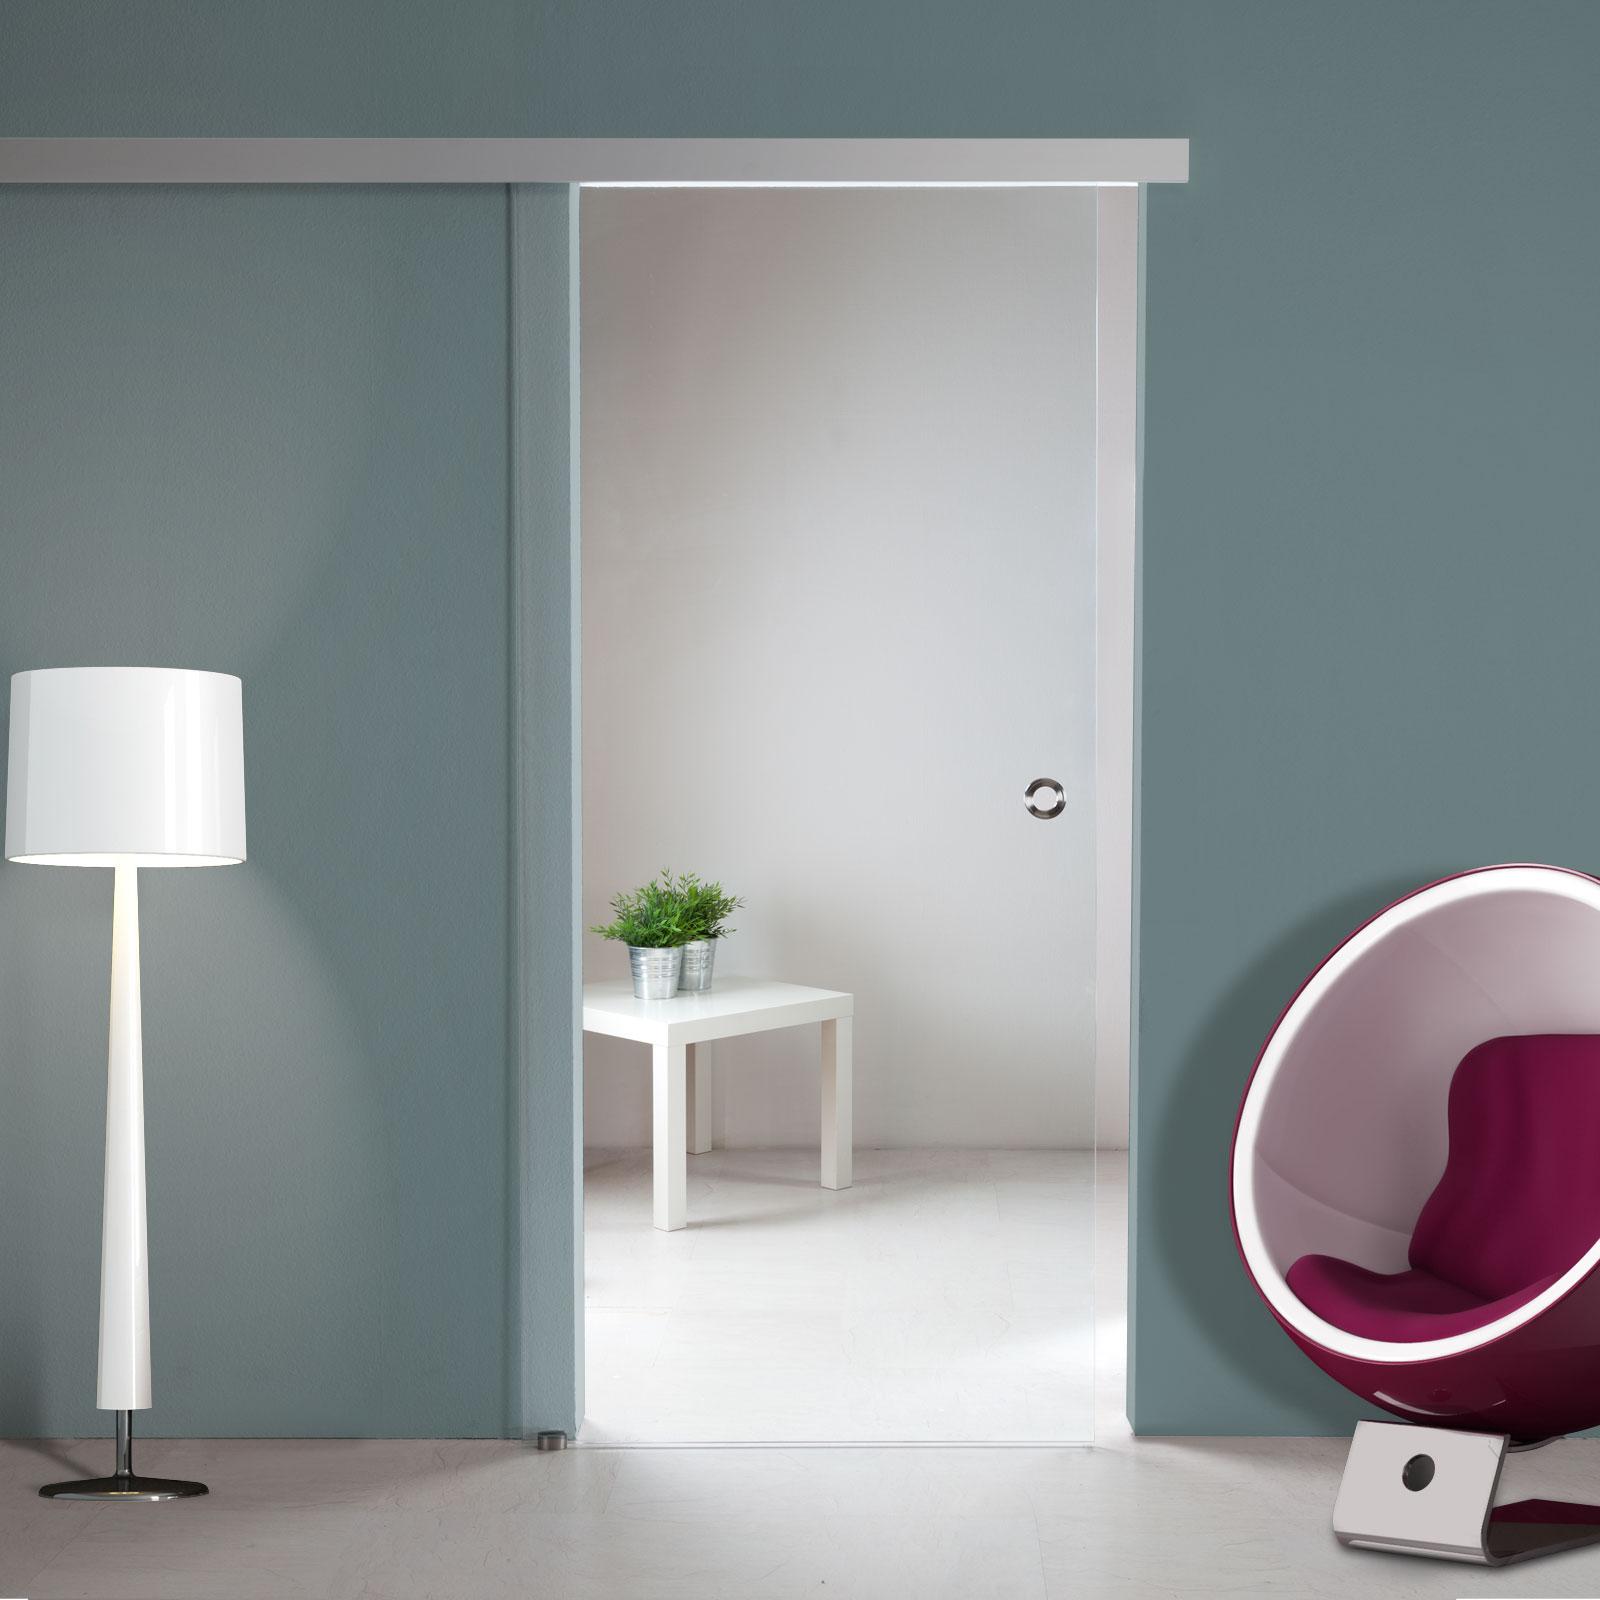 glasschiebet r st722 klarglas mit ag50 schiebesystem option soft close ebay. Black Bedroom Furniture Sets. Home Design Ideas